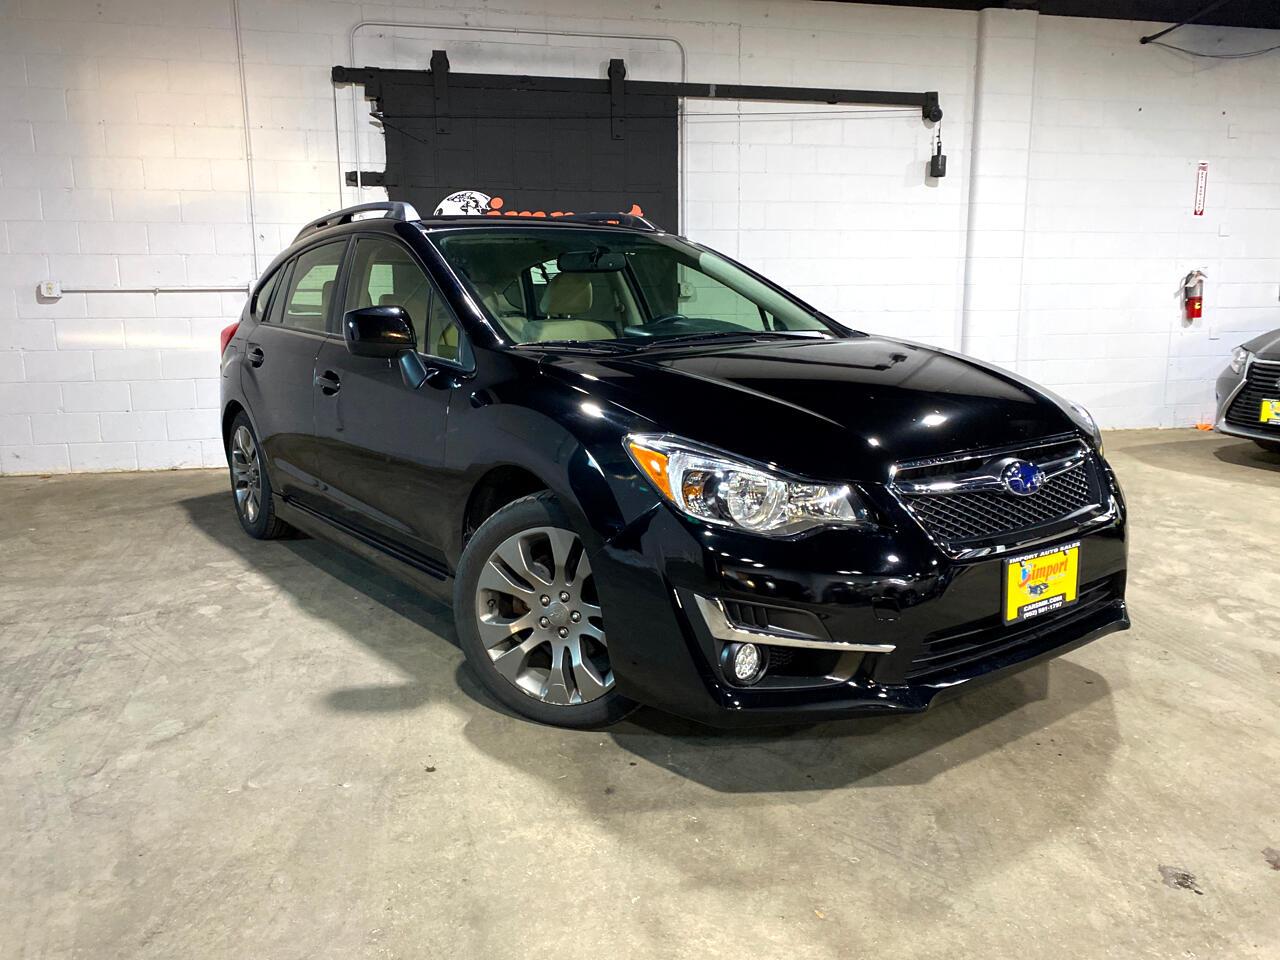 Subaru Impreza Wagon 5dr Man 2.0i Sport Premium 2013